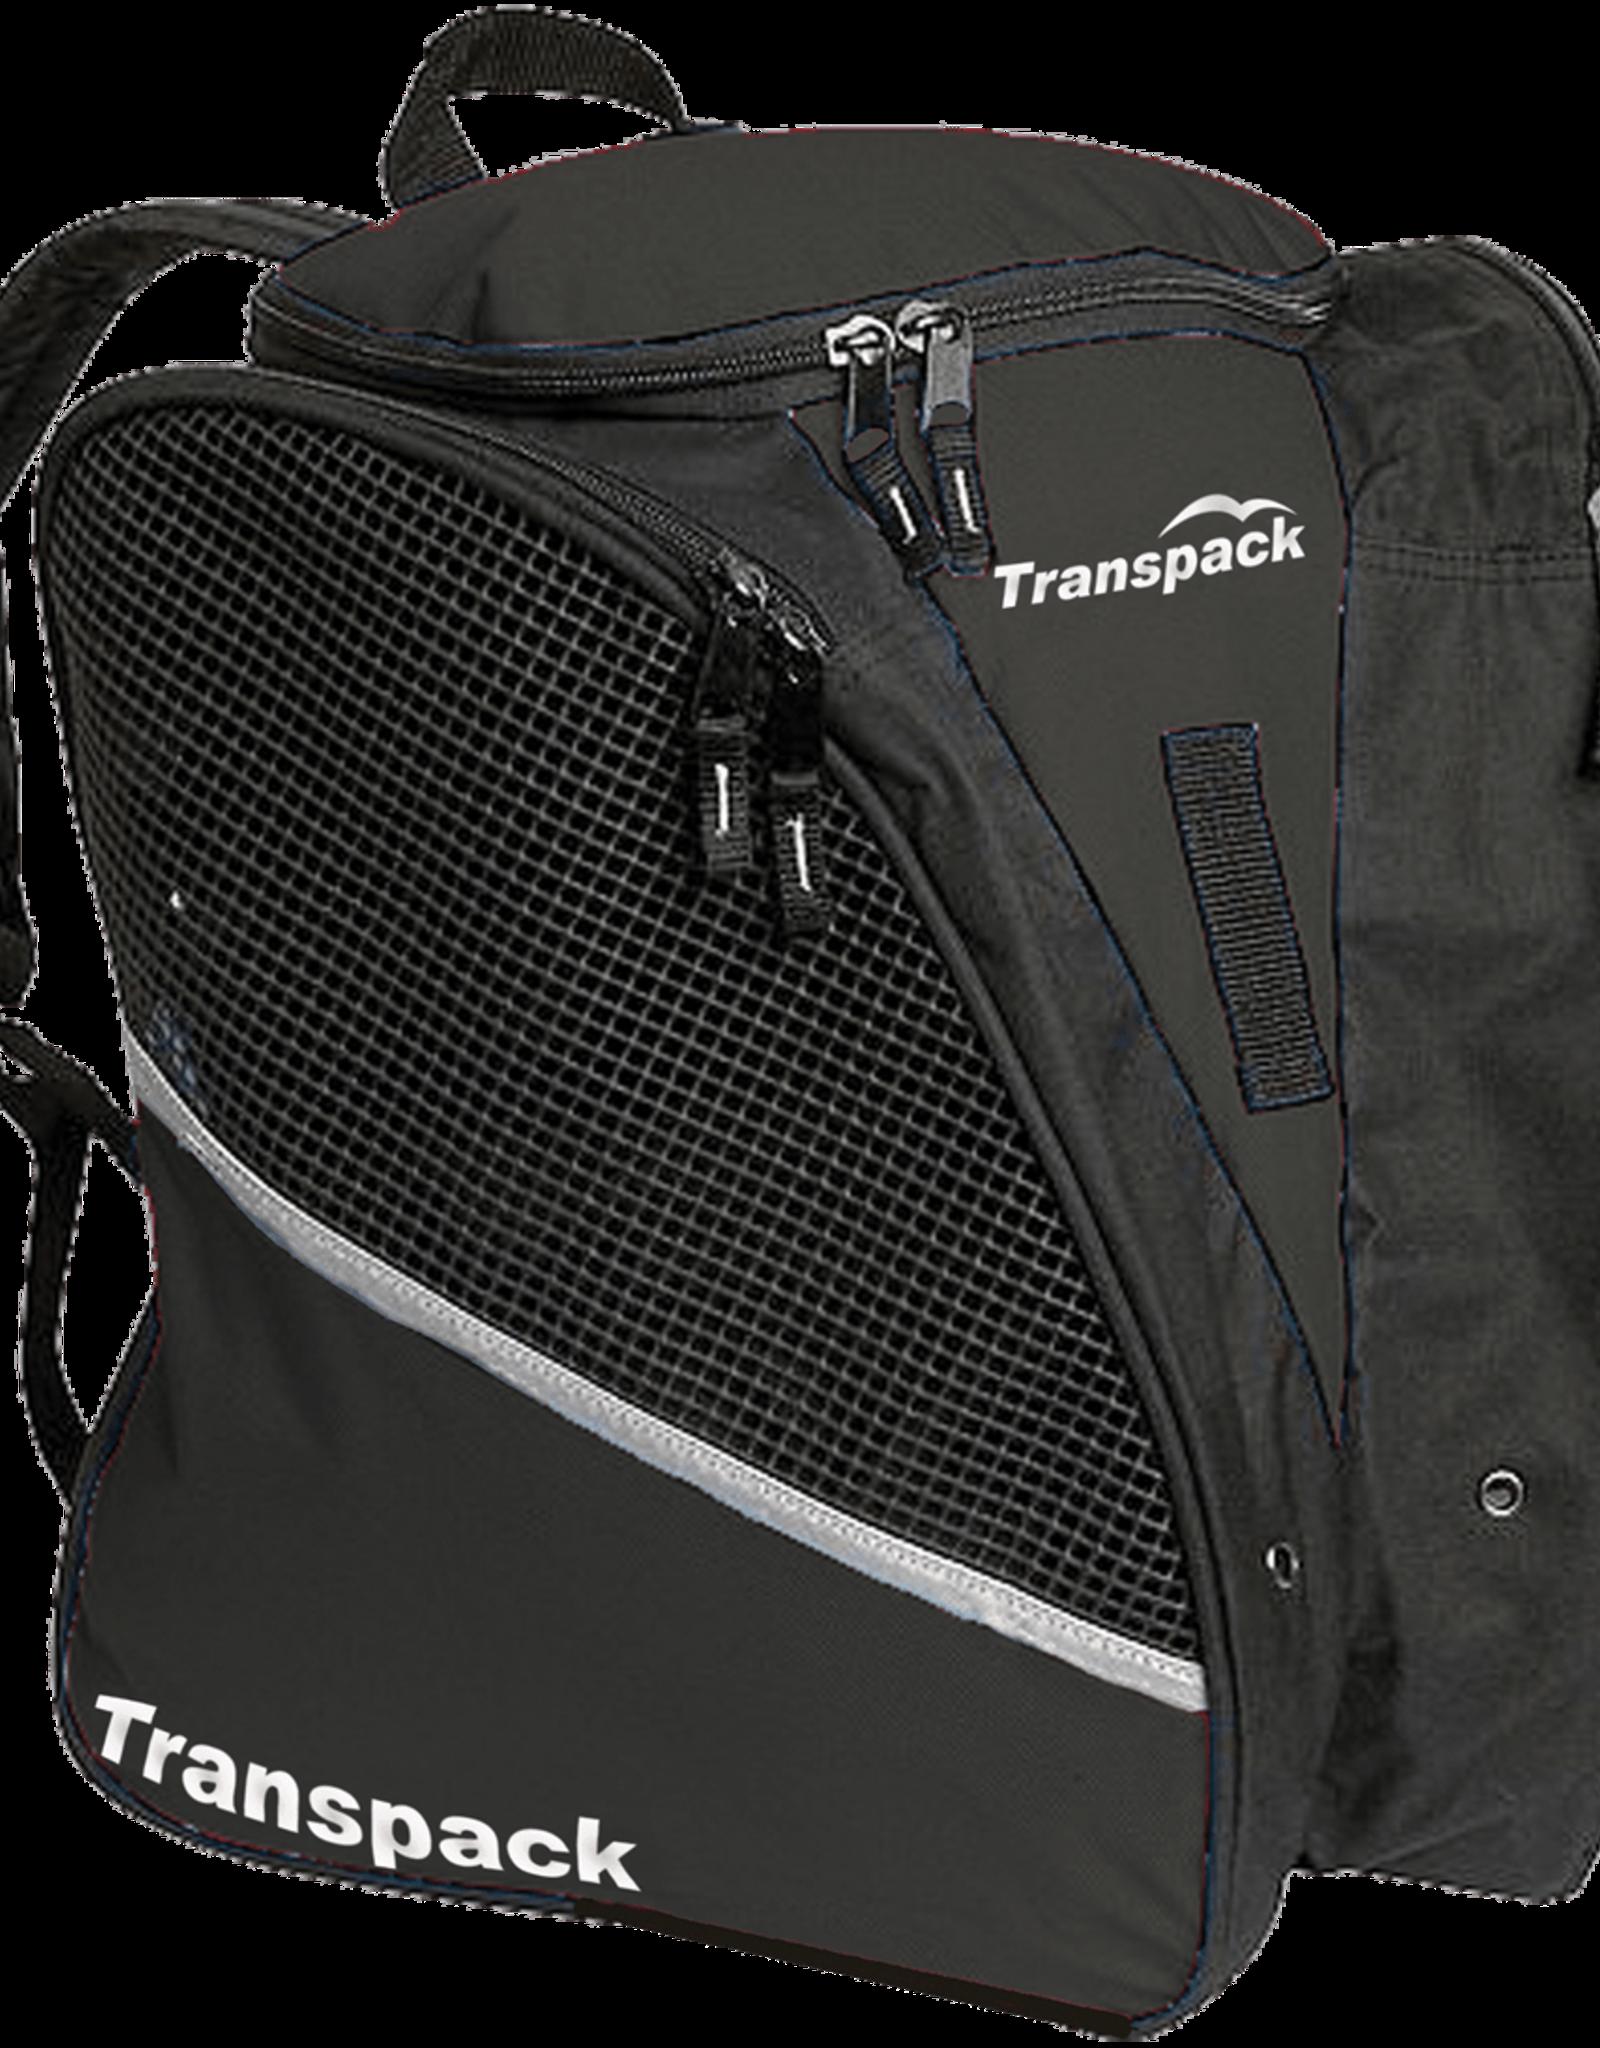 TRANSPACK BACKPACK ICE BLACK